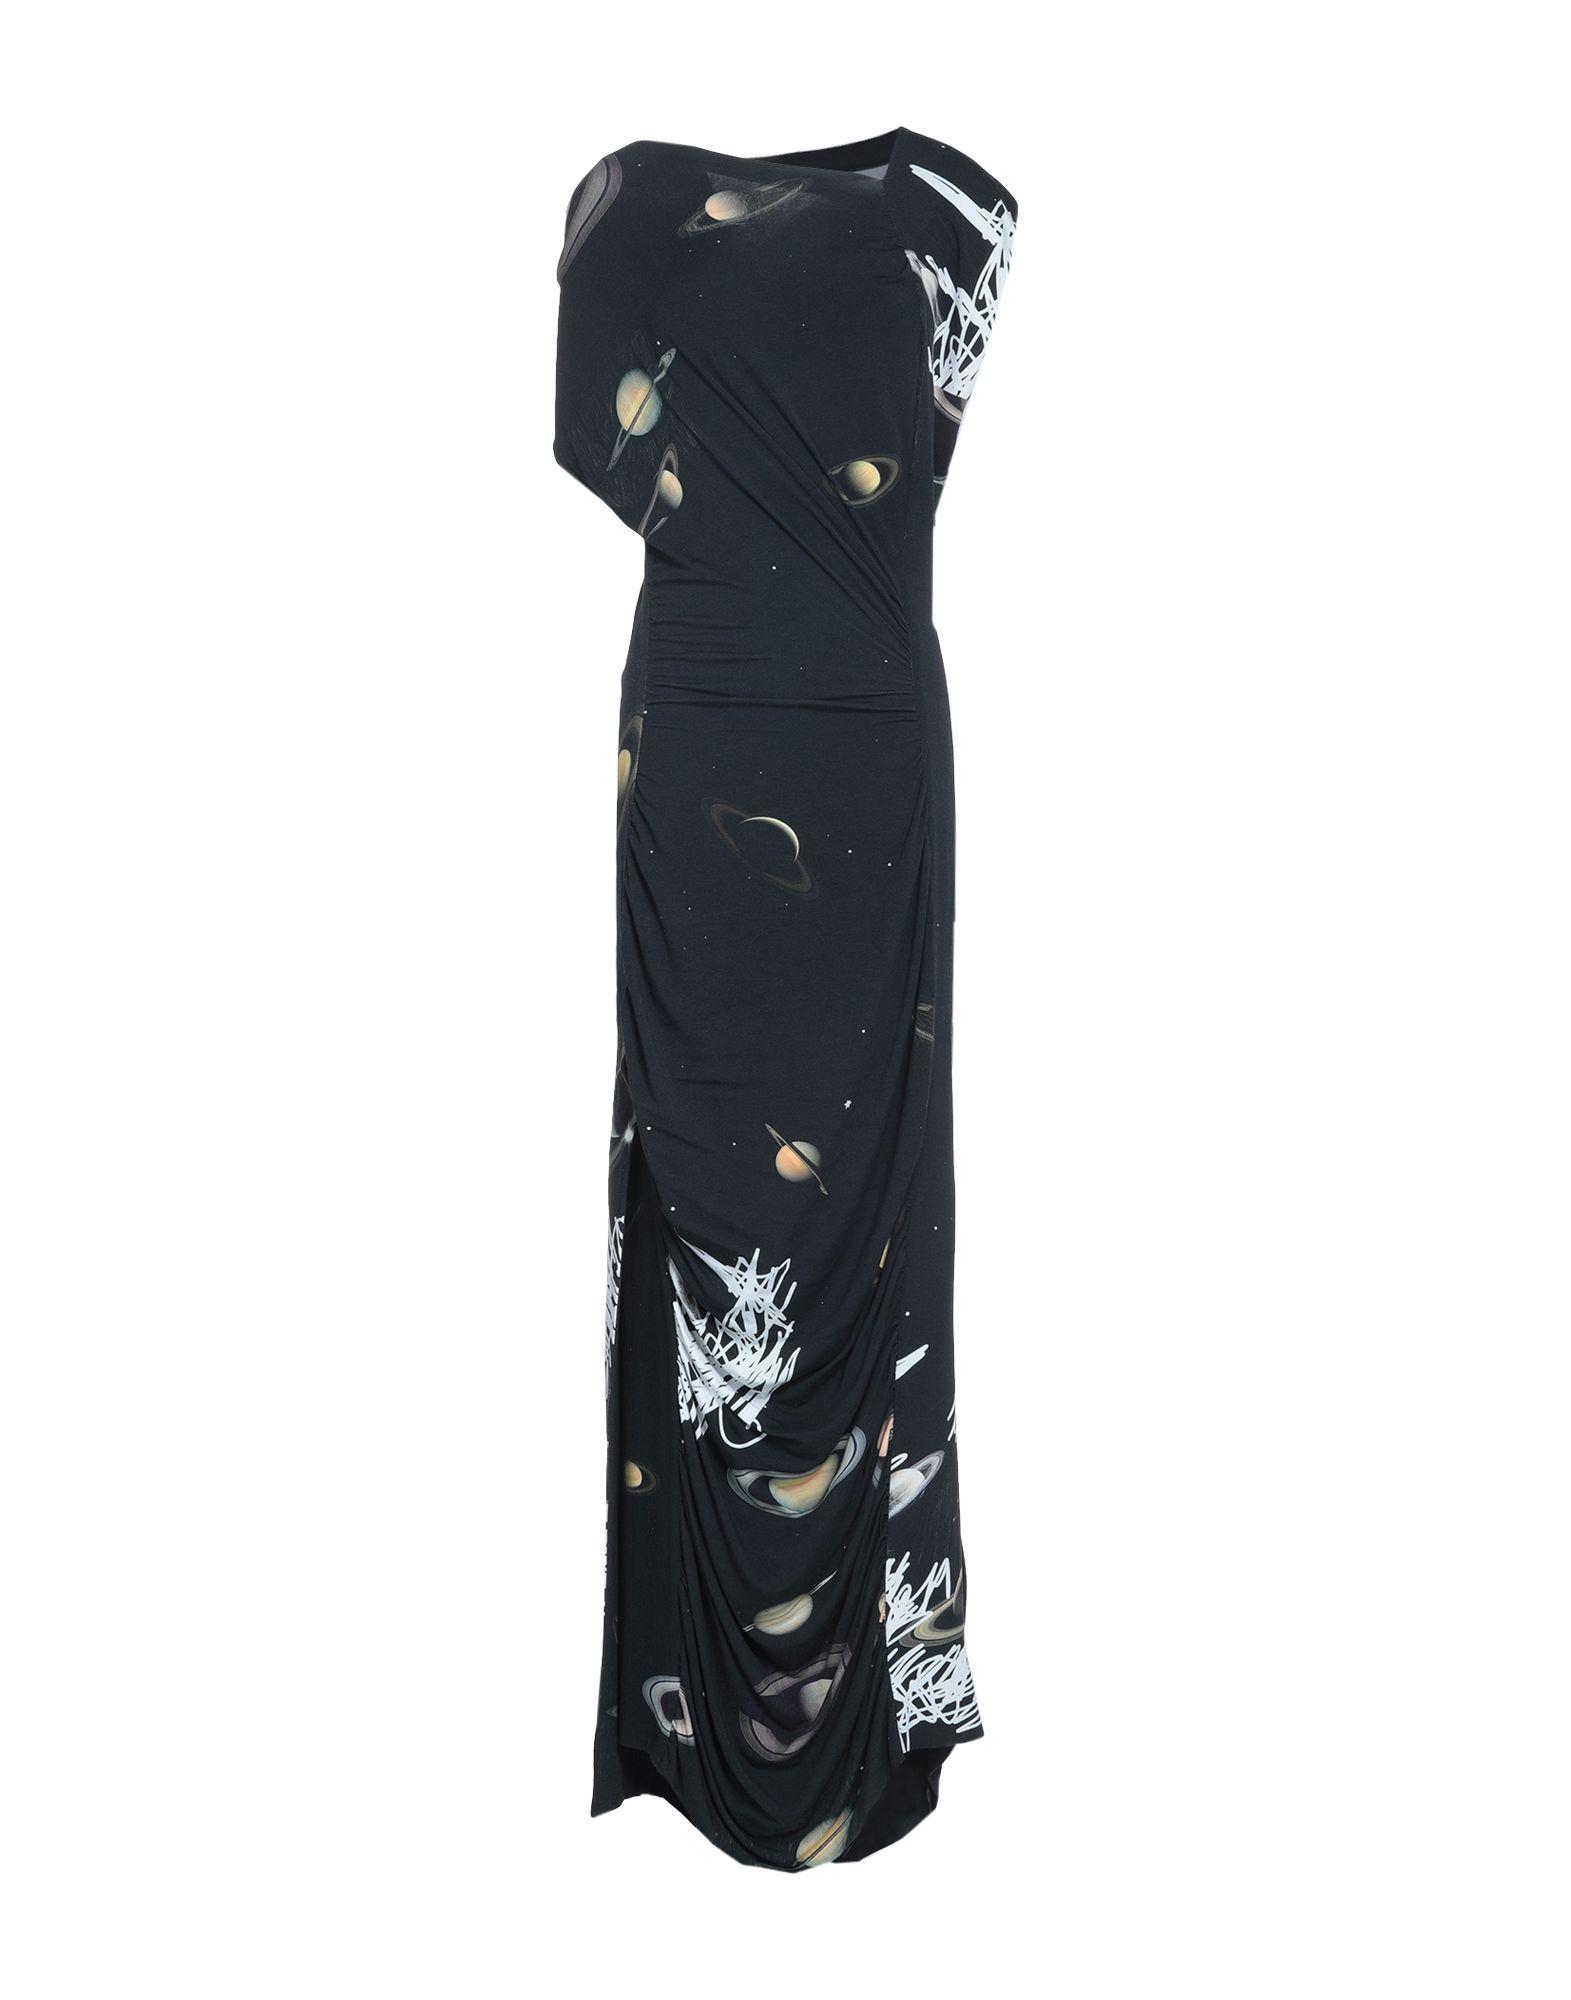 Фото - ANDREAS KRONTHALER x VIVIENNE WESTWOOD Длинное платье vivienne westwood red label длинное платье